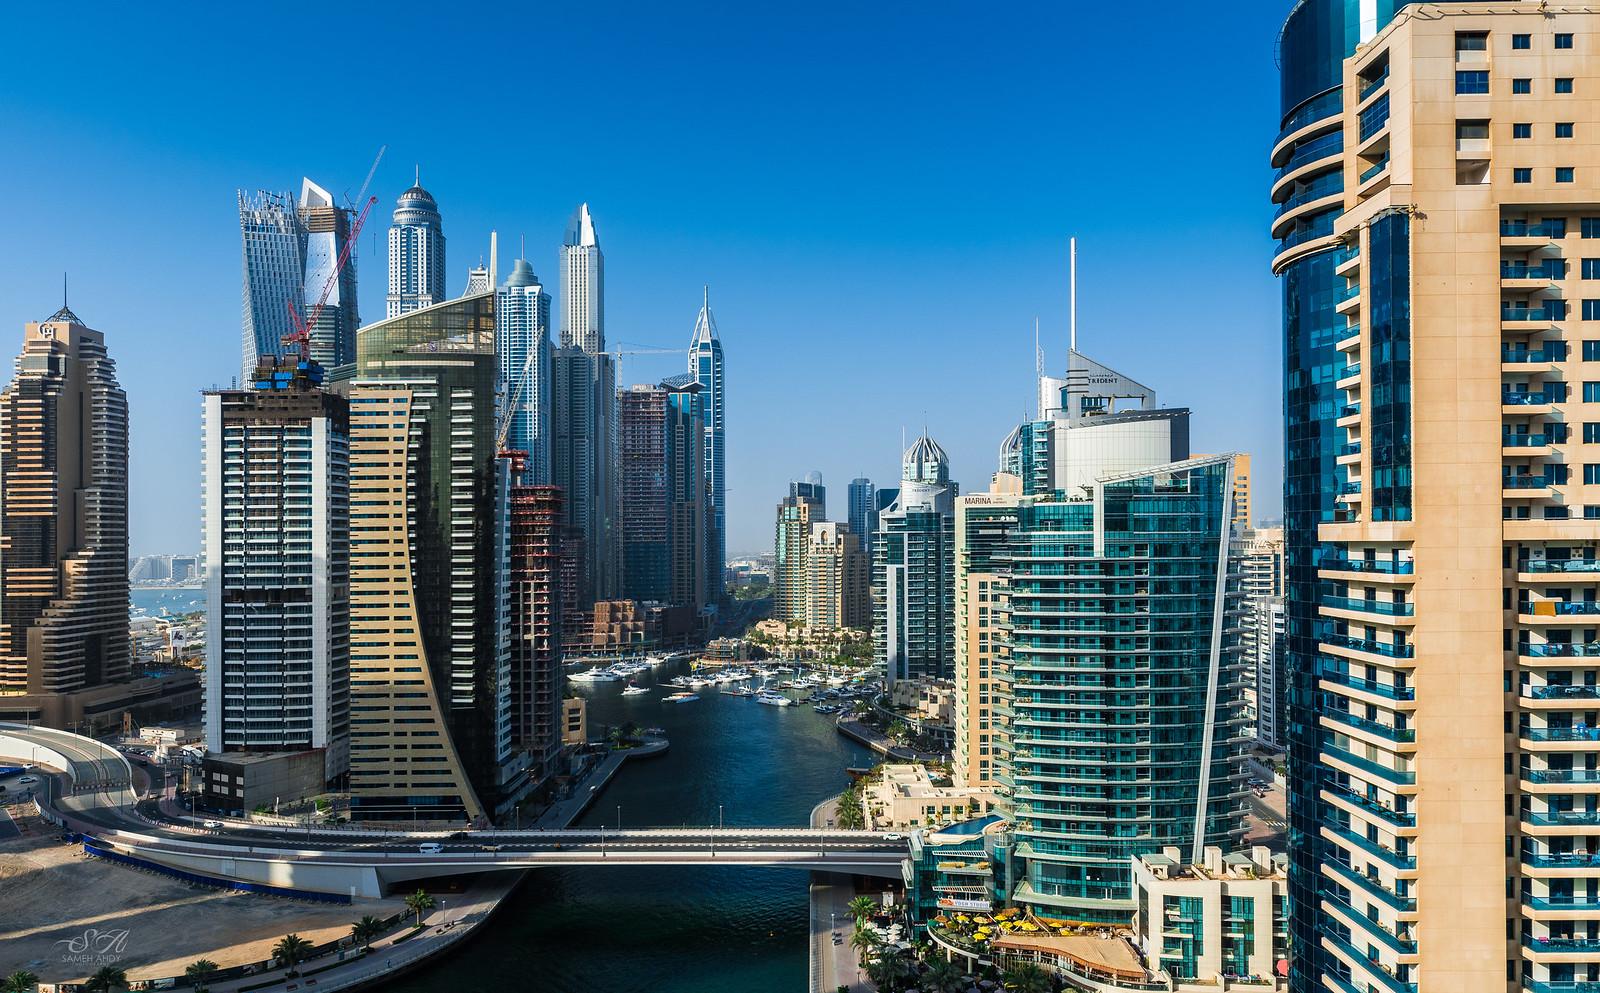 Dubai Marina 1 by Sameh Ahdy, on Flickr